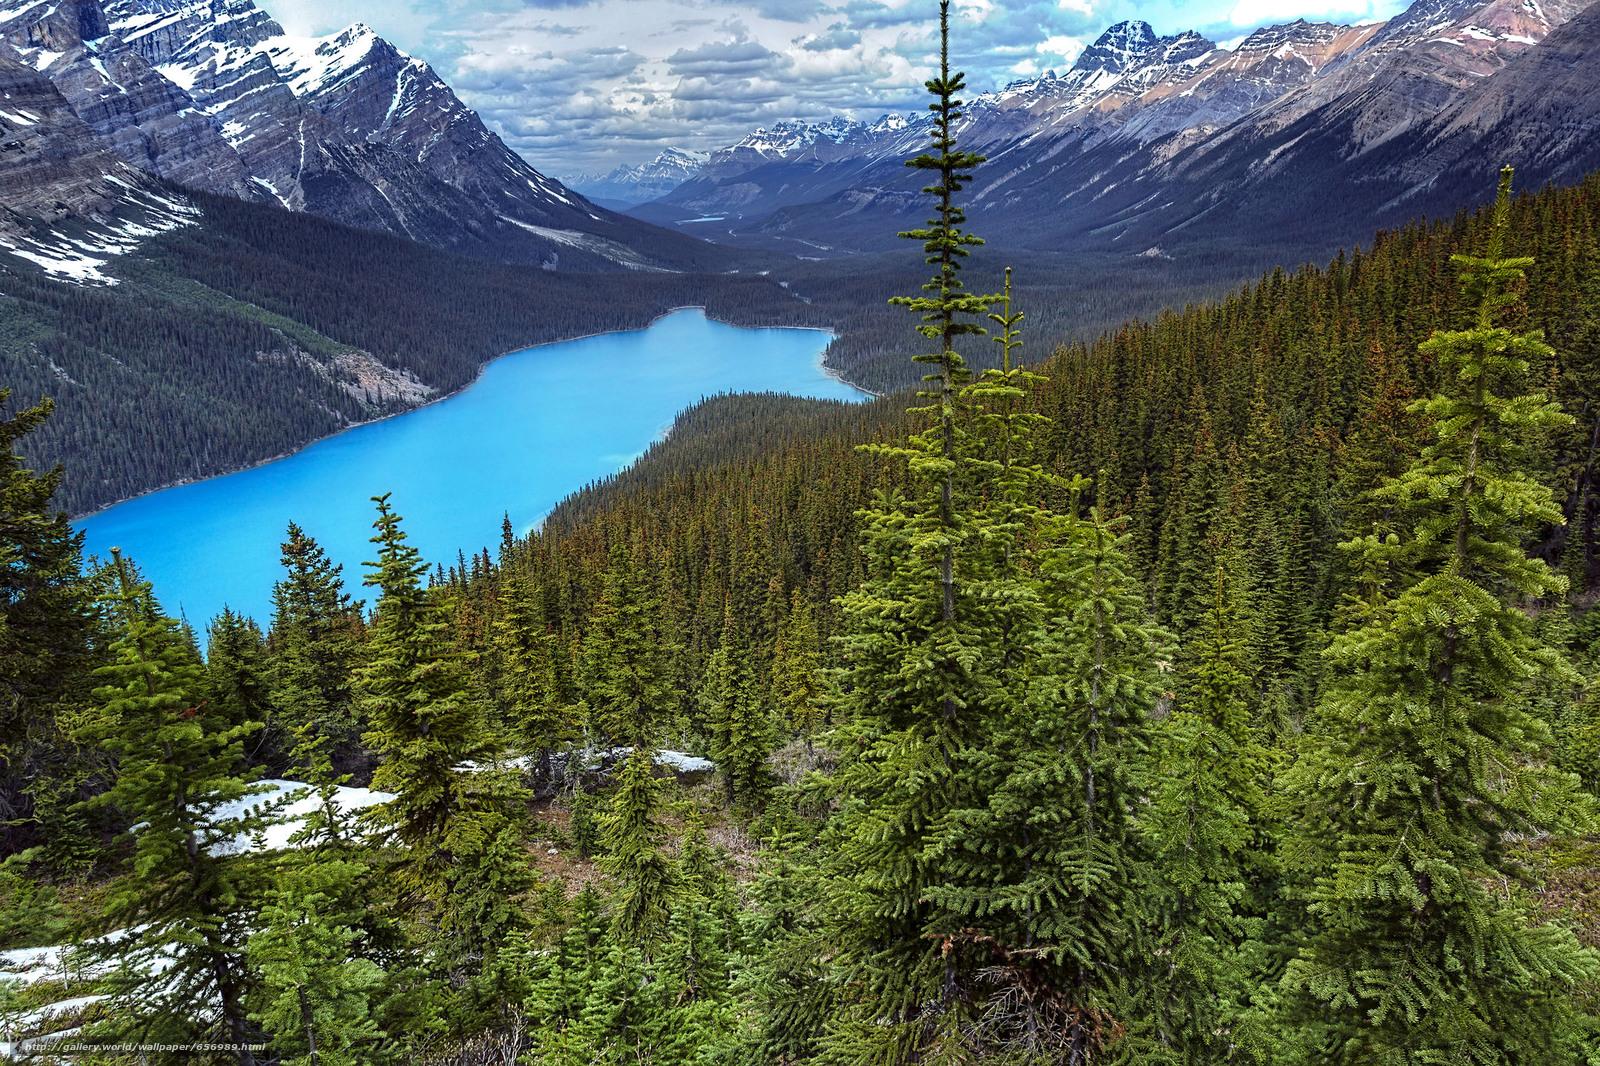 Download wallpaper Peyto Lake,  Banff National Park,  Alberta,  Canada free desktop wallpaper in the resolution 2048x1365 — picture №656989